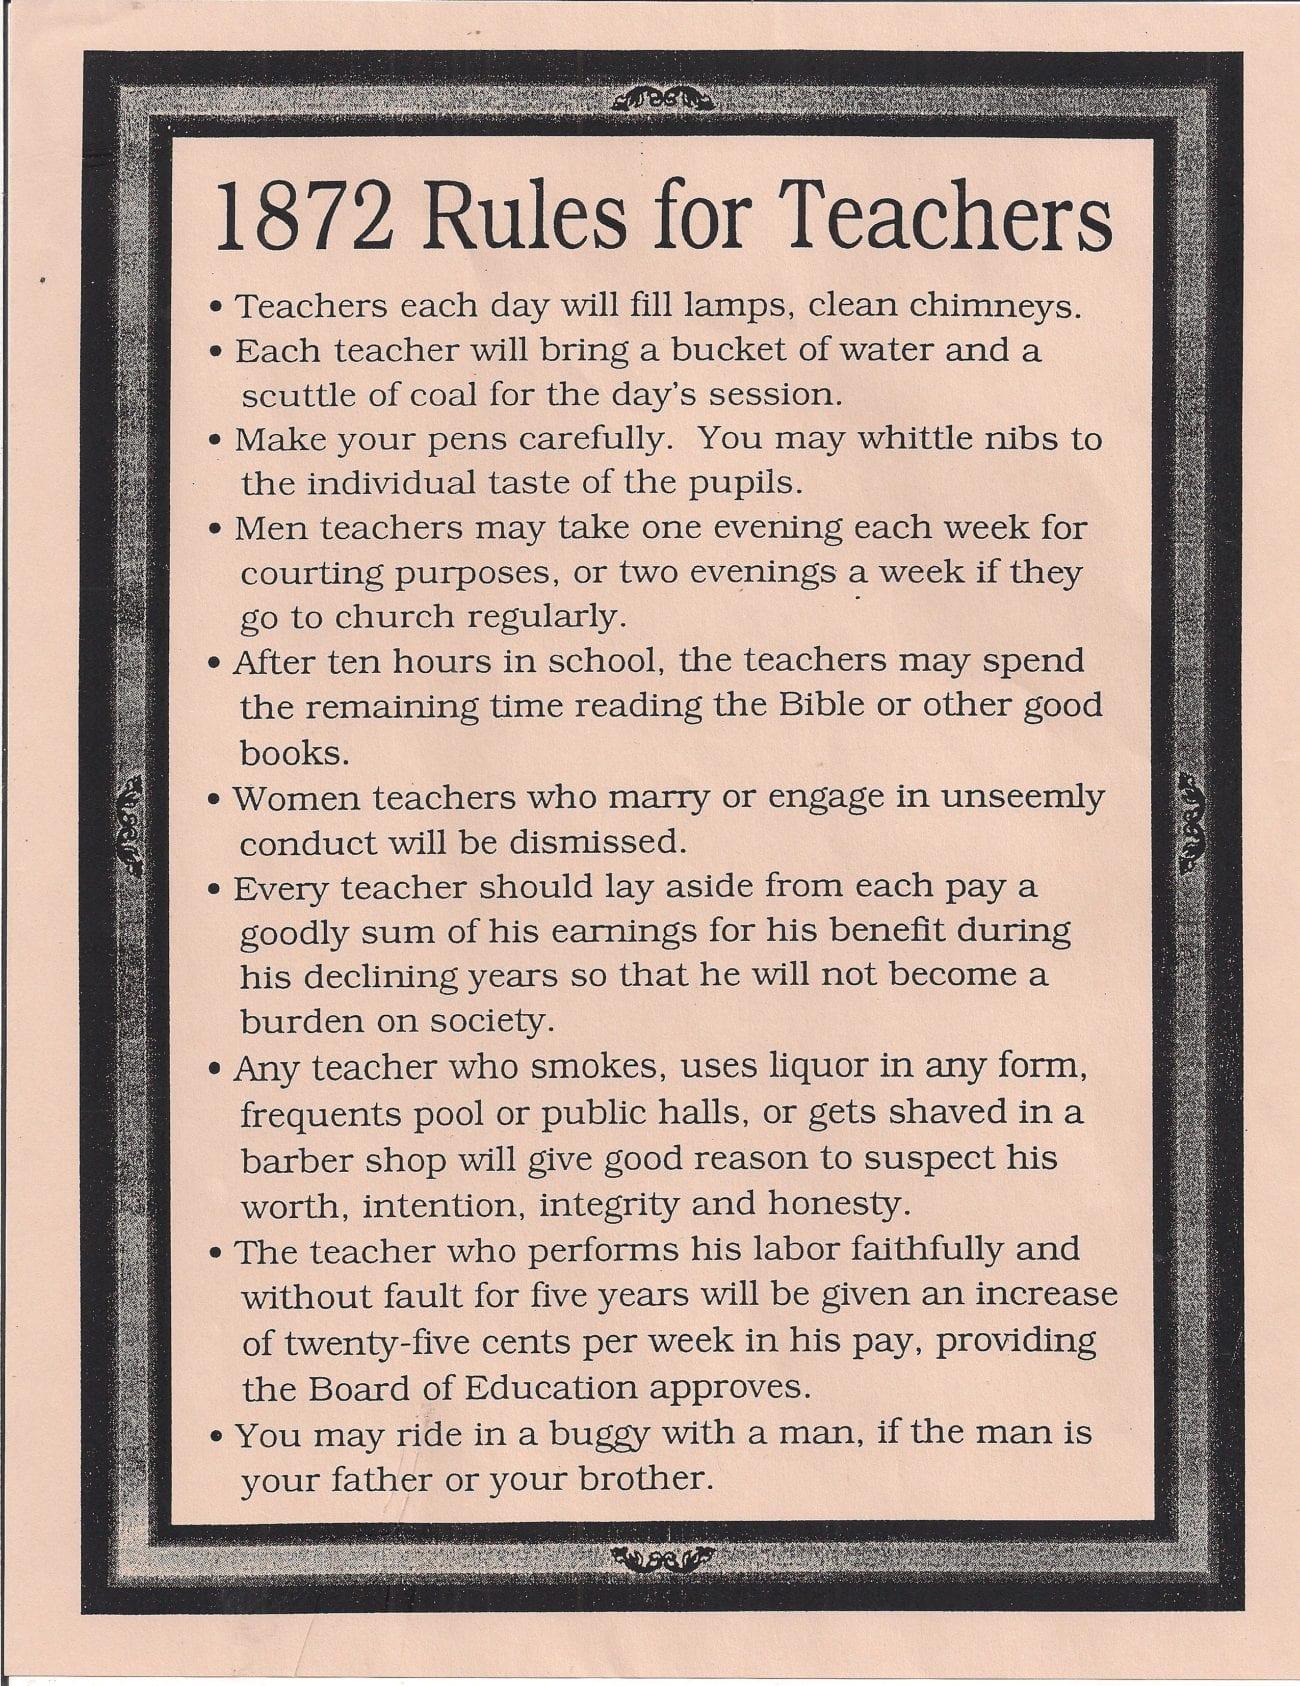 Retro School Rules That Will Definitely Make You Lol